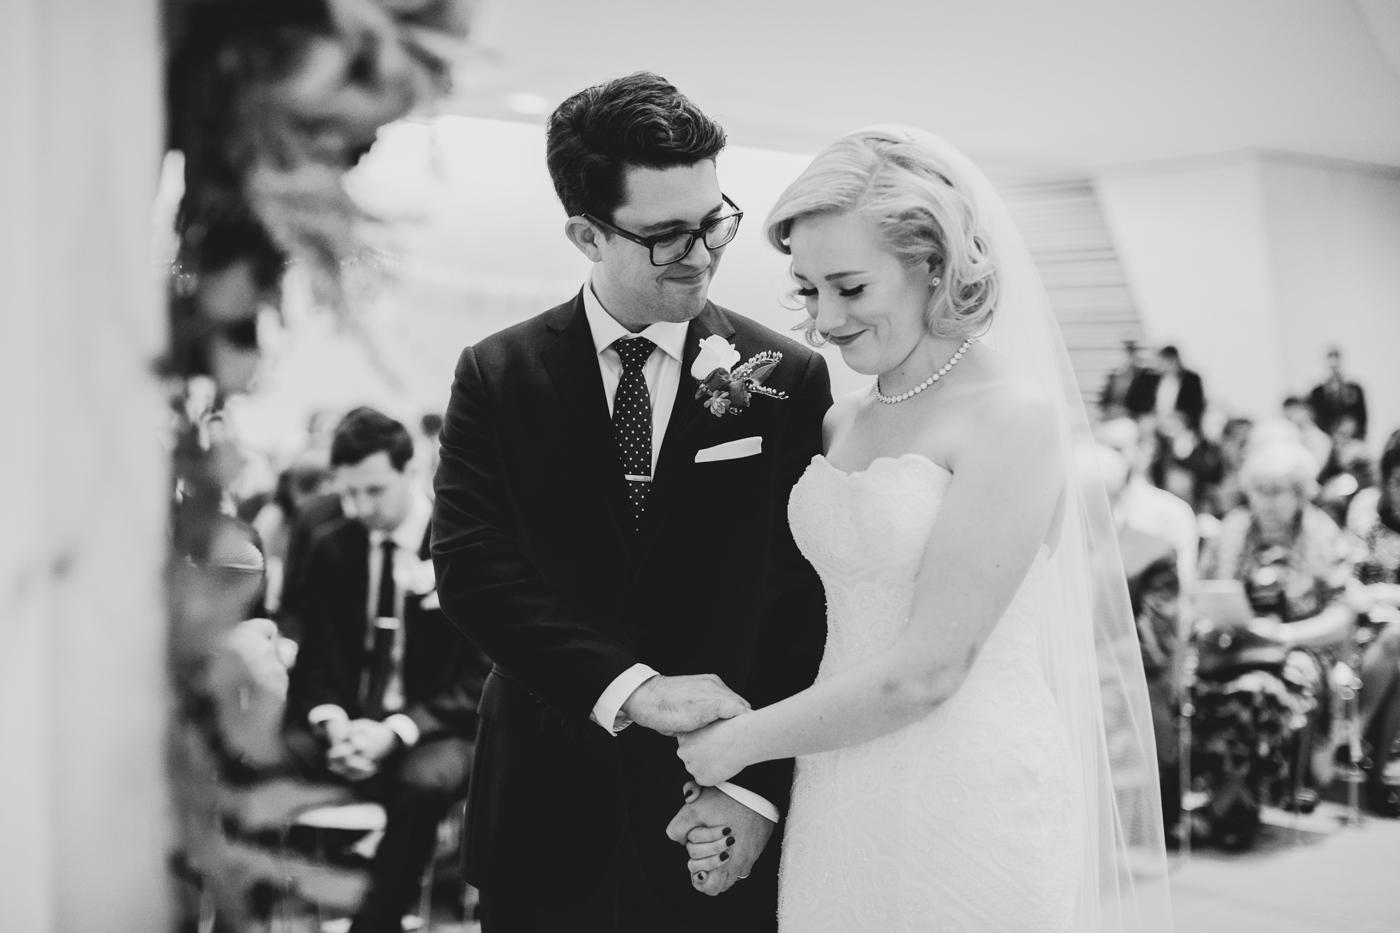 Jo & Tom Wedding - The Grounds of Alexandria - Samantha Heather Photography-135.jpg